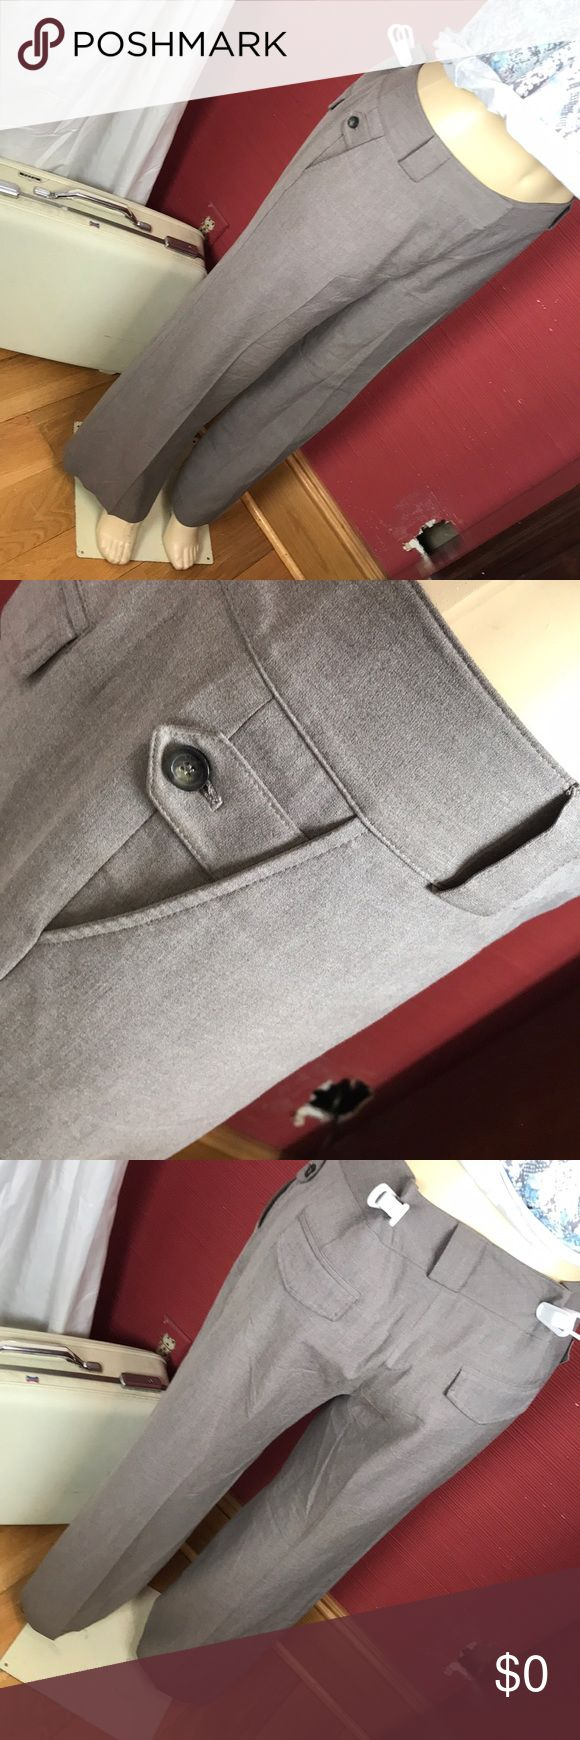 Pants TBD MICHAEL Michael Kors Pants Trousers